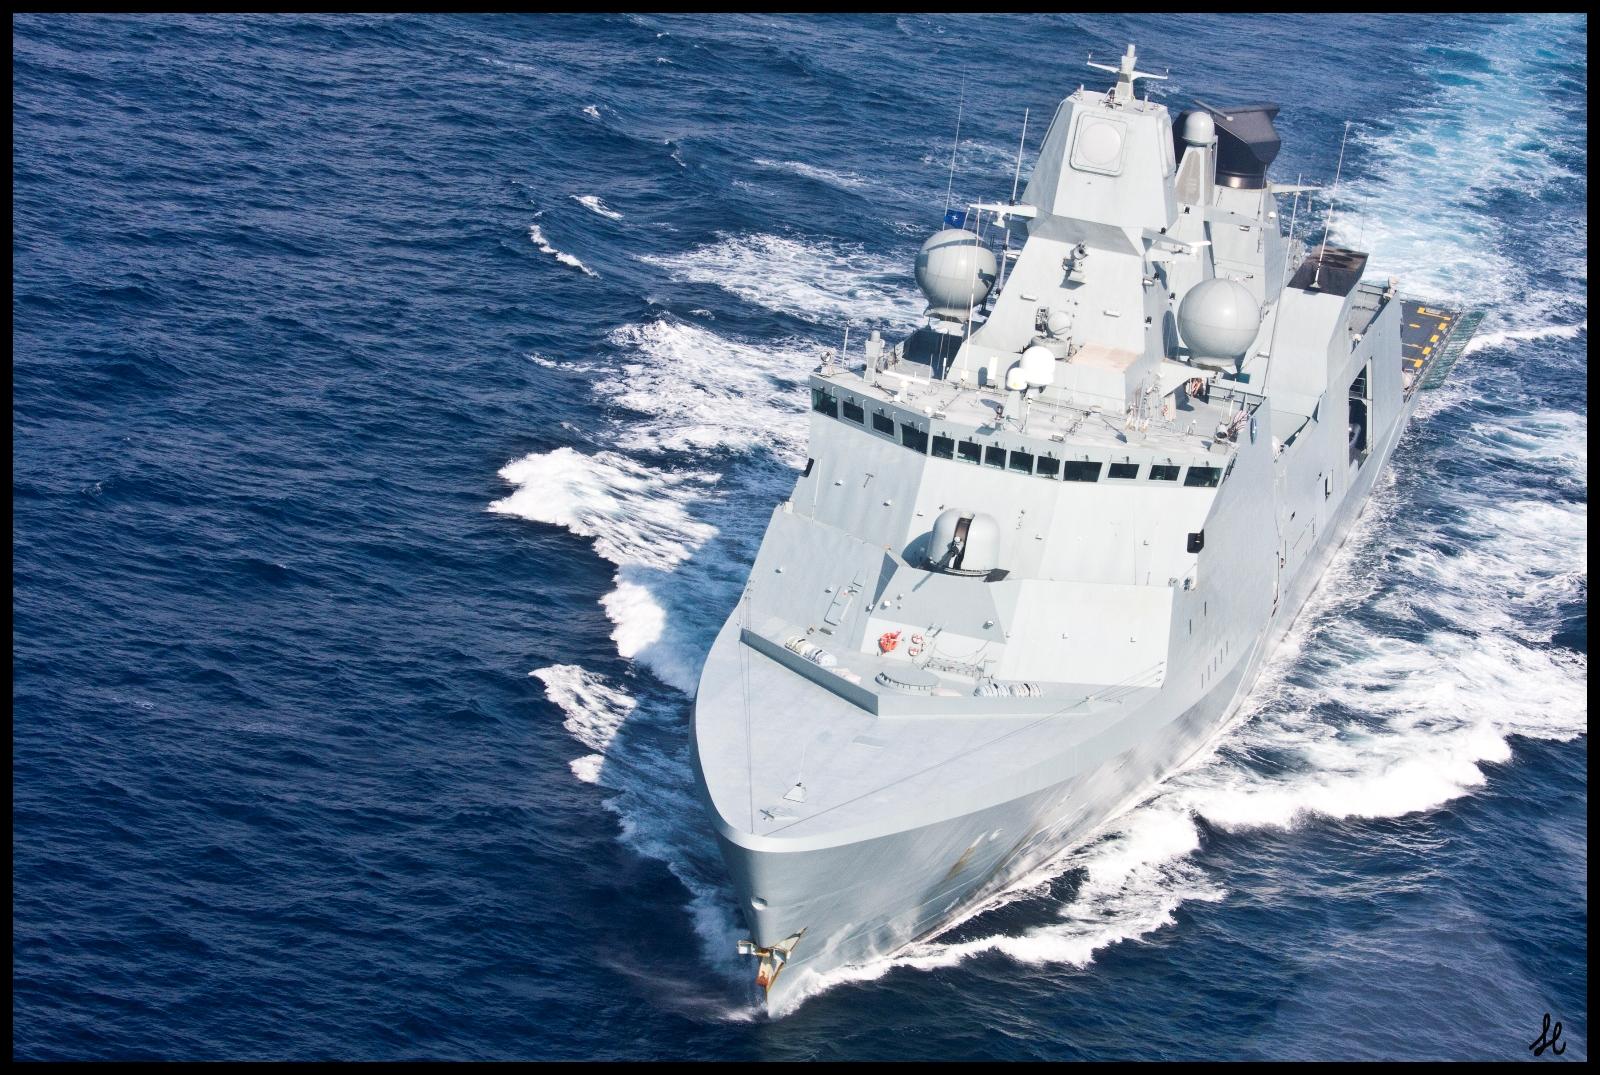 Danish warship Iver Huitfeldt Photo: NATO